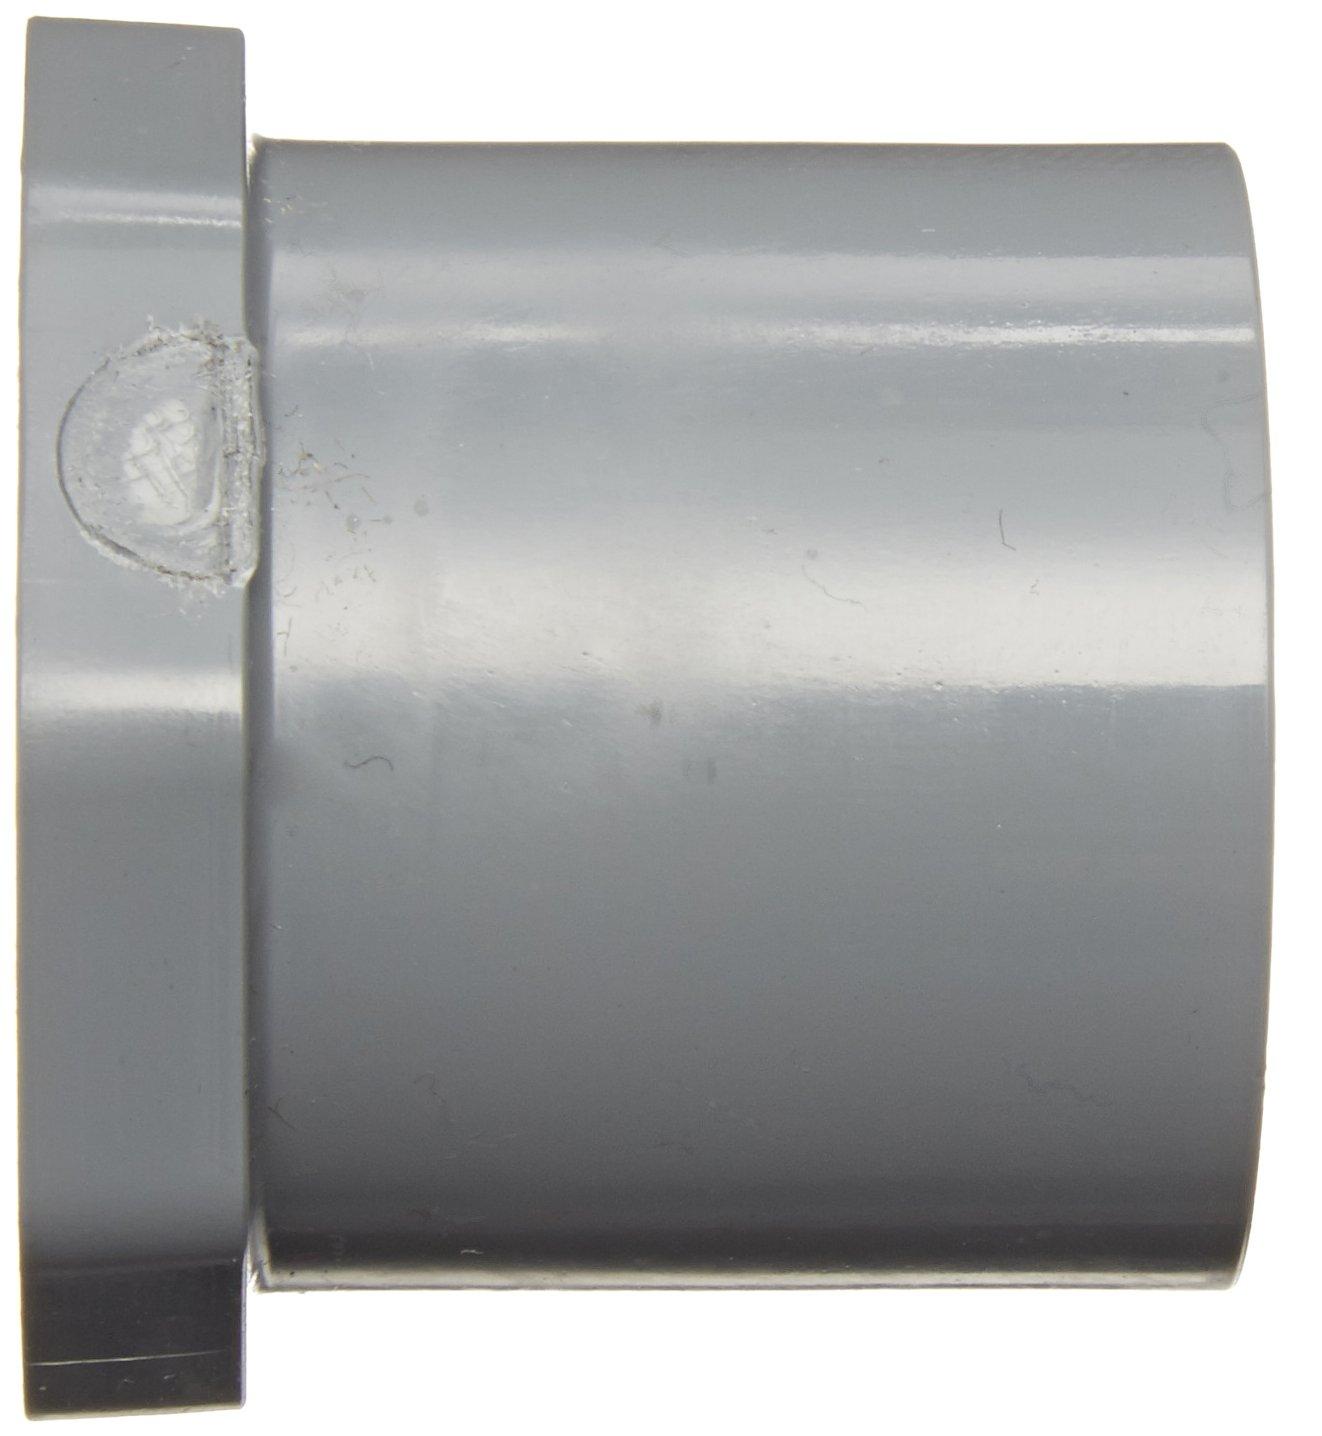 Bushing Spears 838-C Series CPVC Pipe Fitting Schedule 80 1-1//2 Spigot x 1 NPT Female